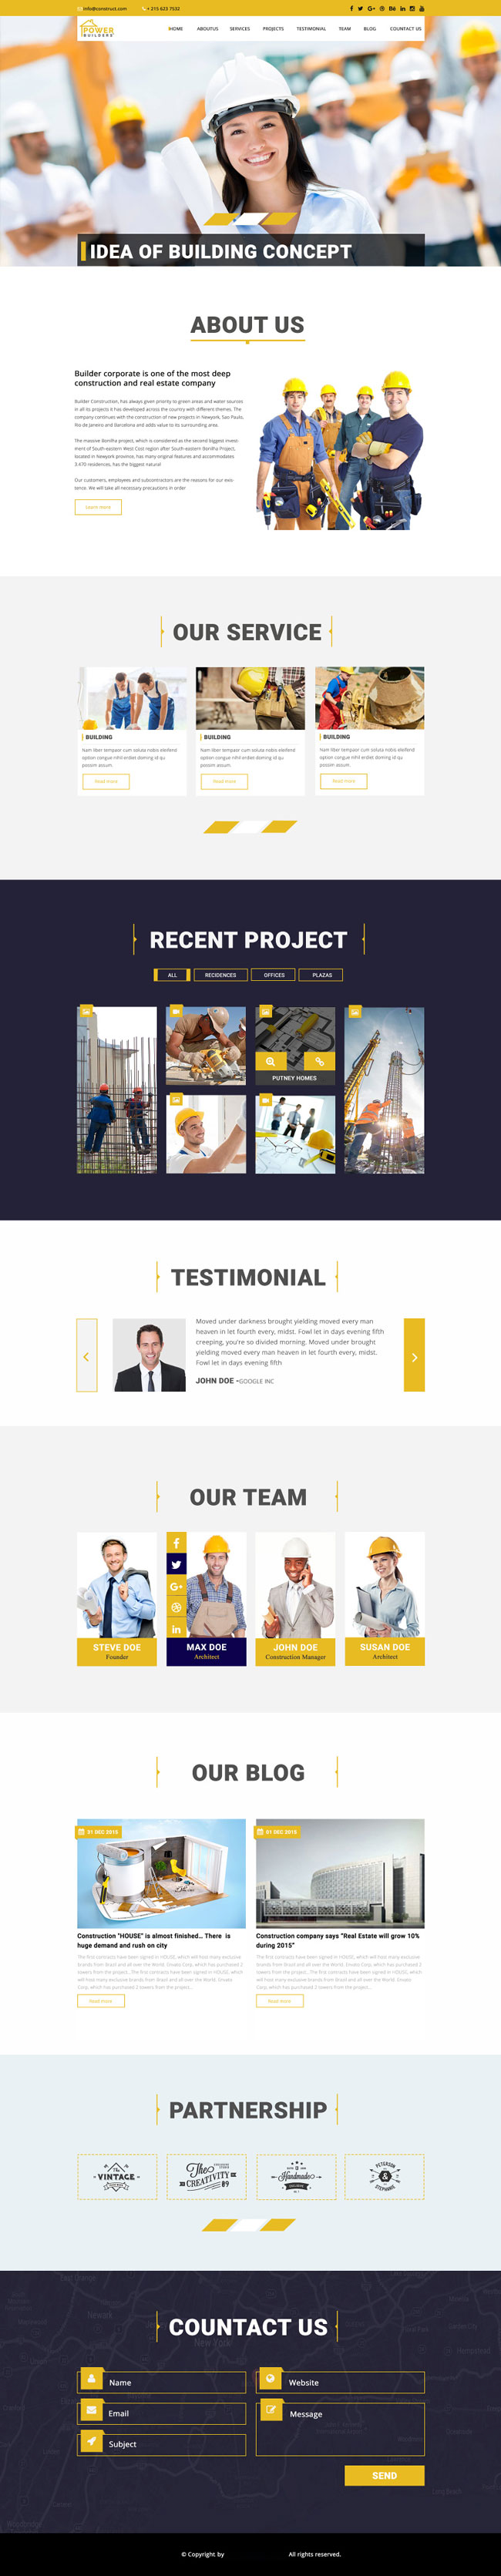 p401 - قالب آماده لایه باز وب سایت تک صفحه ای فنی مهندسی و ساختمانی